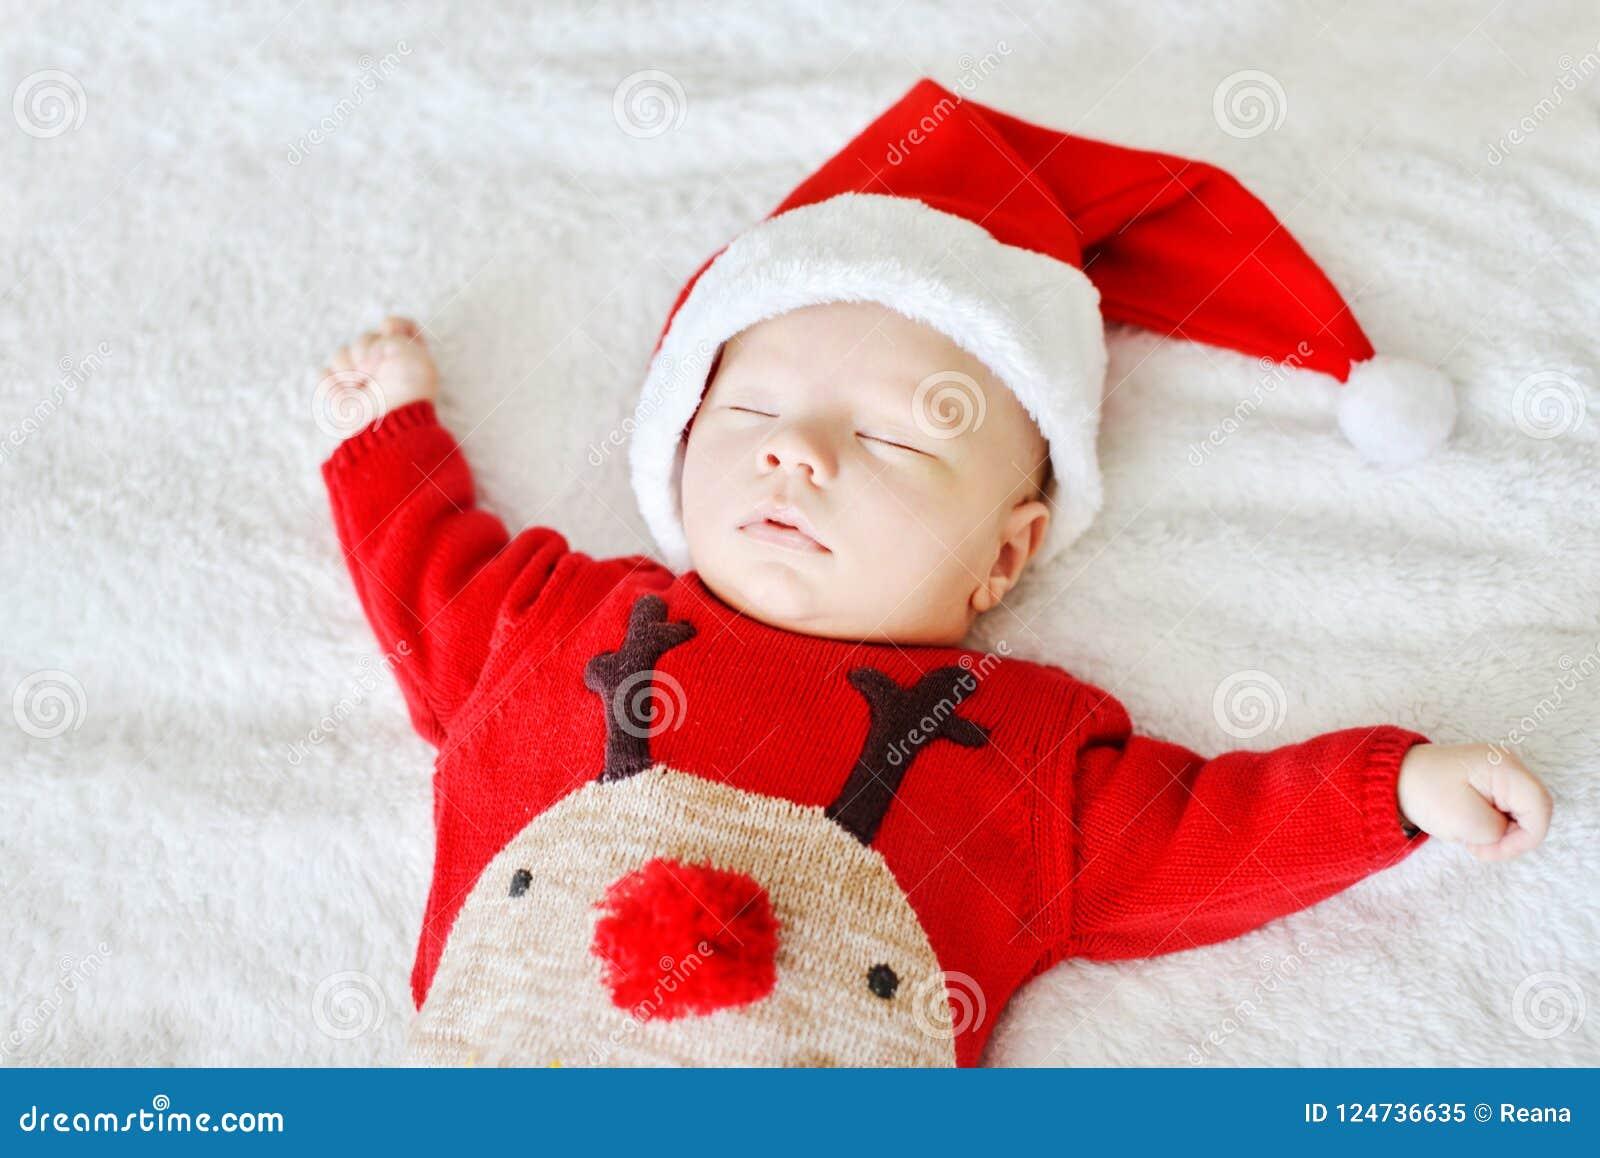 Sleeping Newborn Baby Santa Stock Image - Image of innocent a786c996505